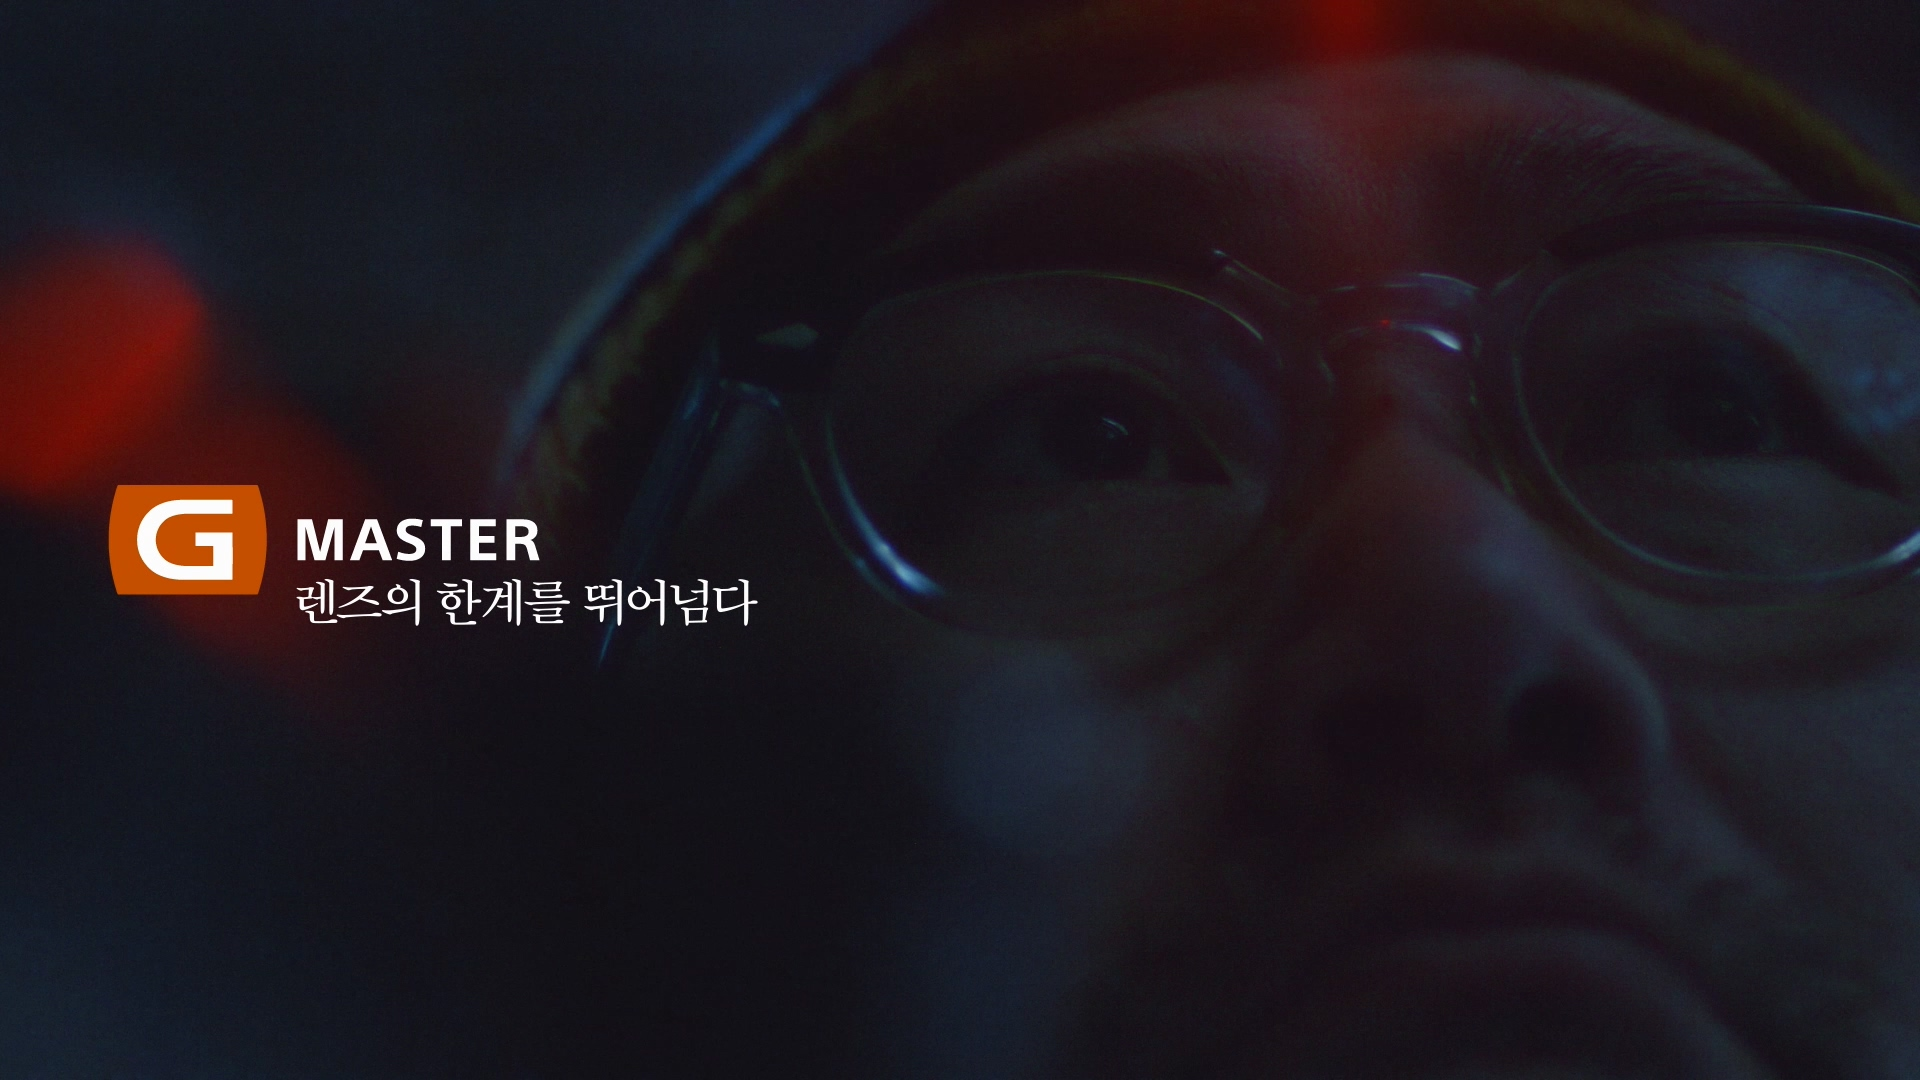 Sony GMaster 천체편 60s